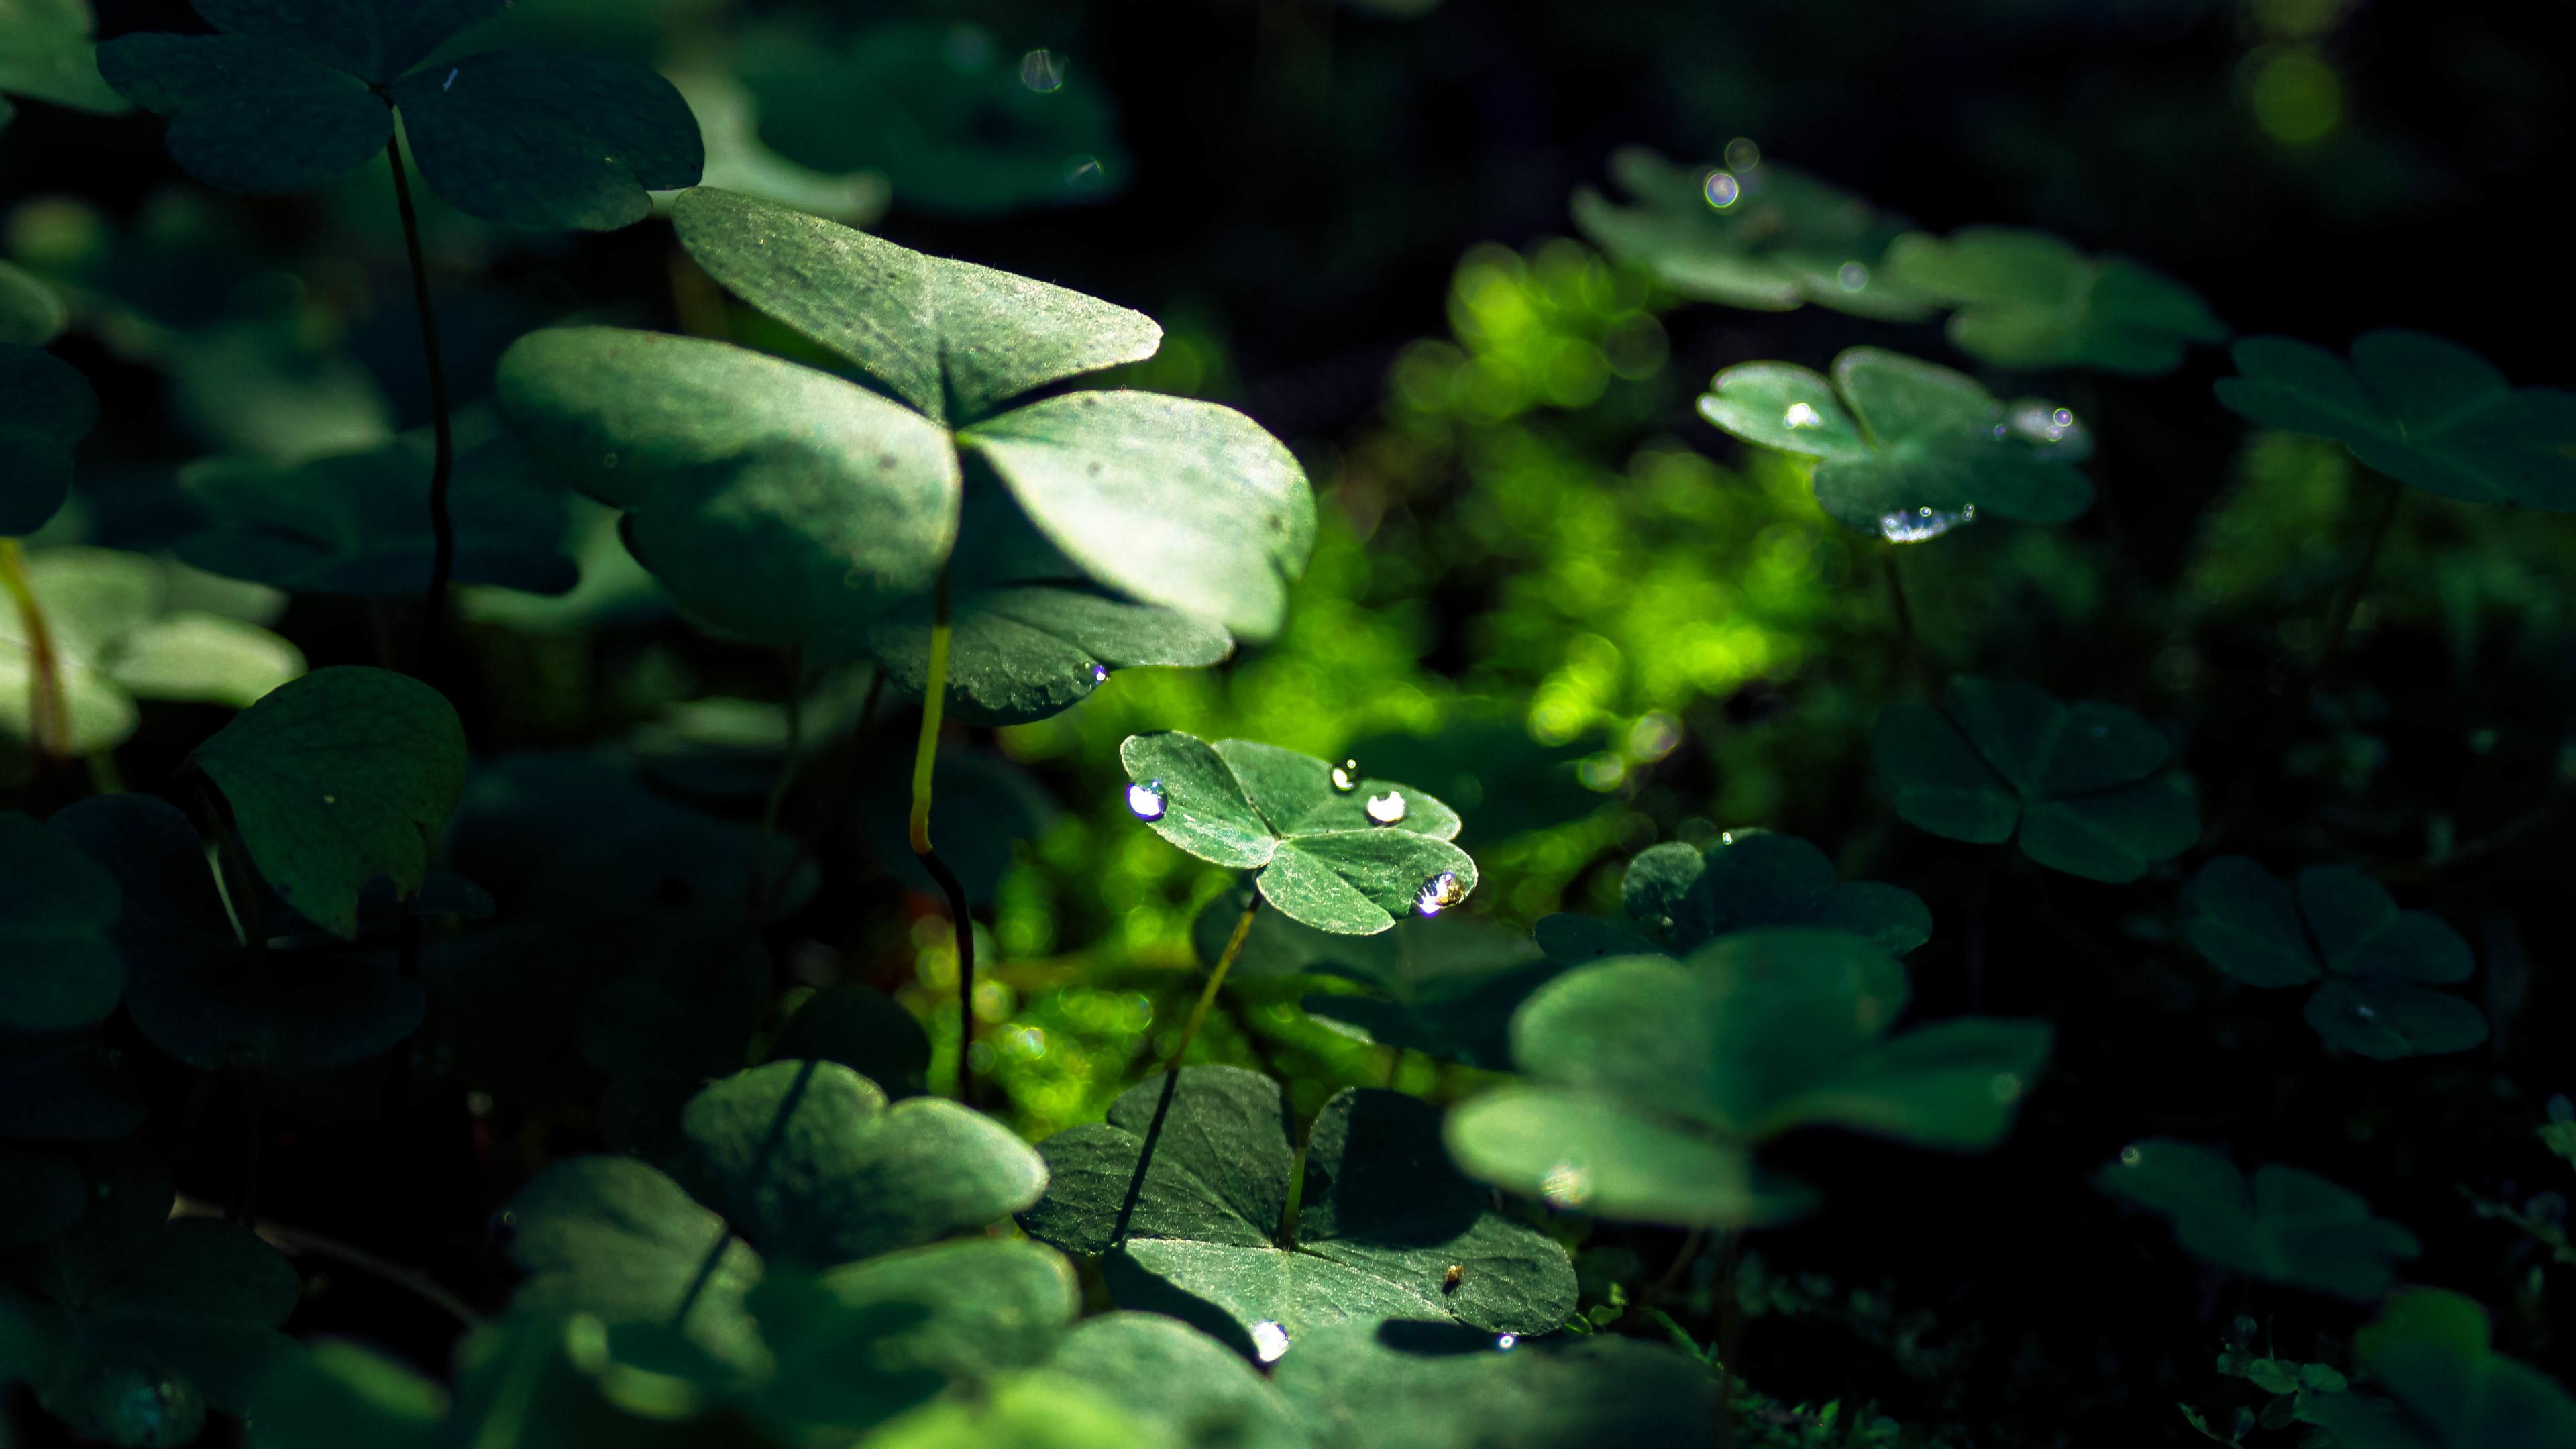 Green Leaf Macro Nature Grass Water Drop 4k Iphone Four Leaf Clover 3840x2160 Wallpaper Teahub Io